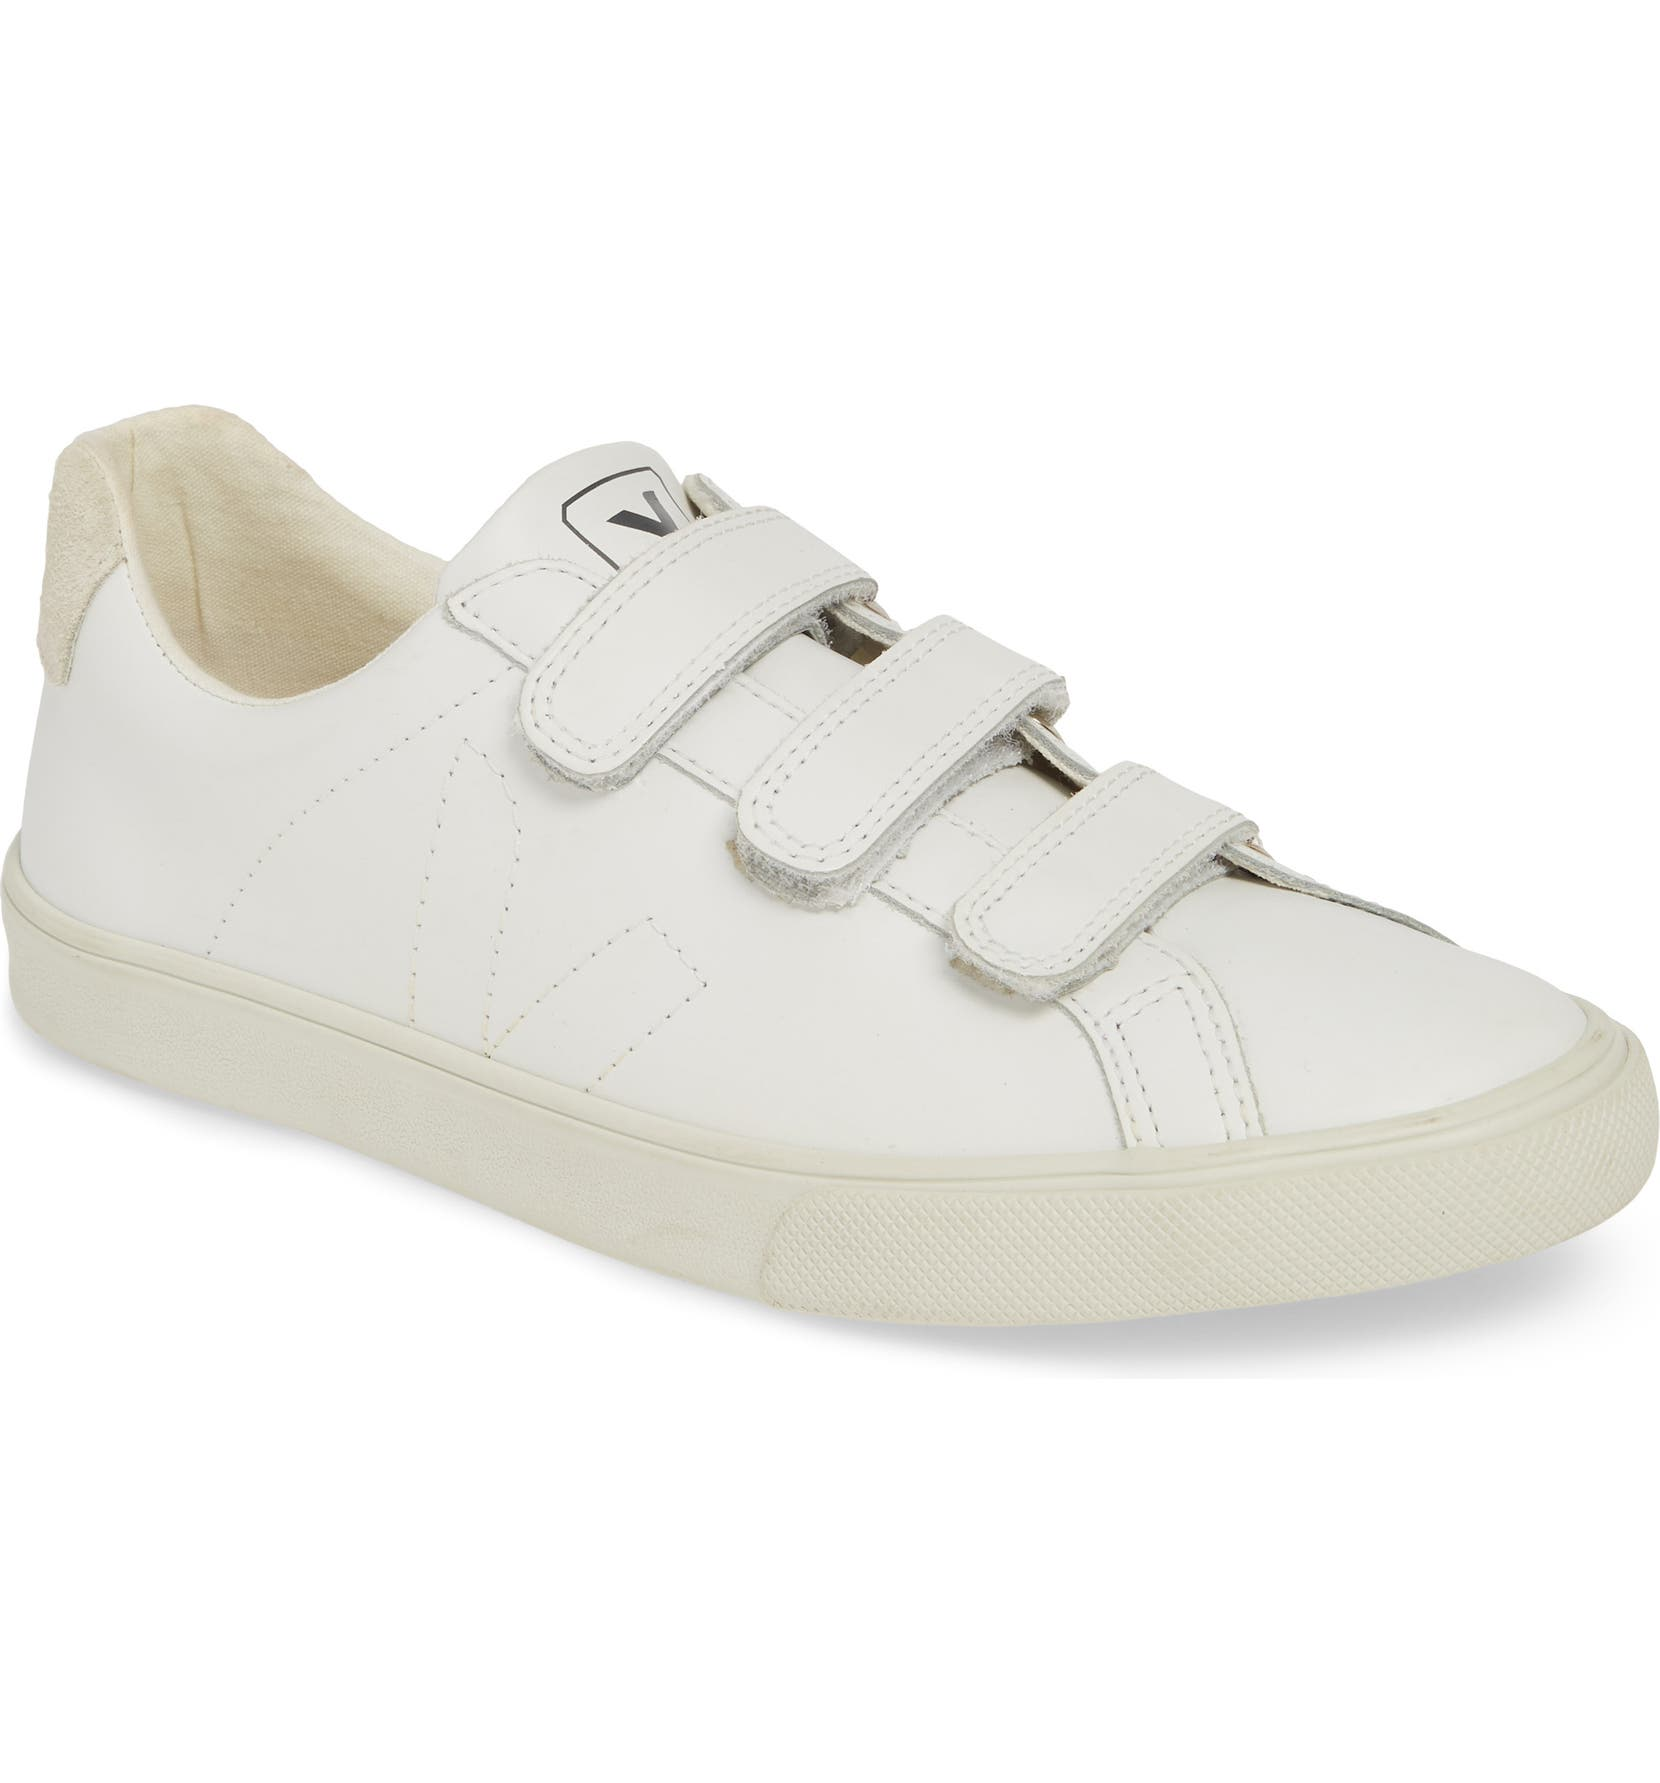 c4737807ef7 Esplar 3-Lock Sneaker